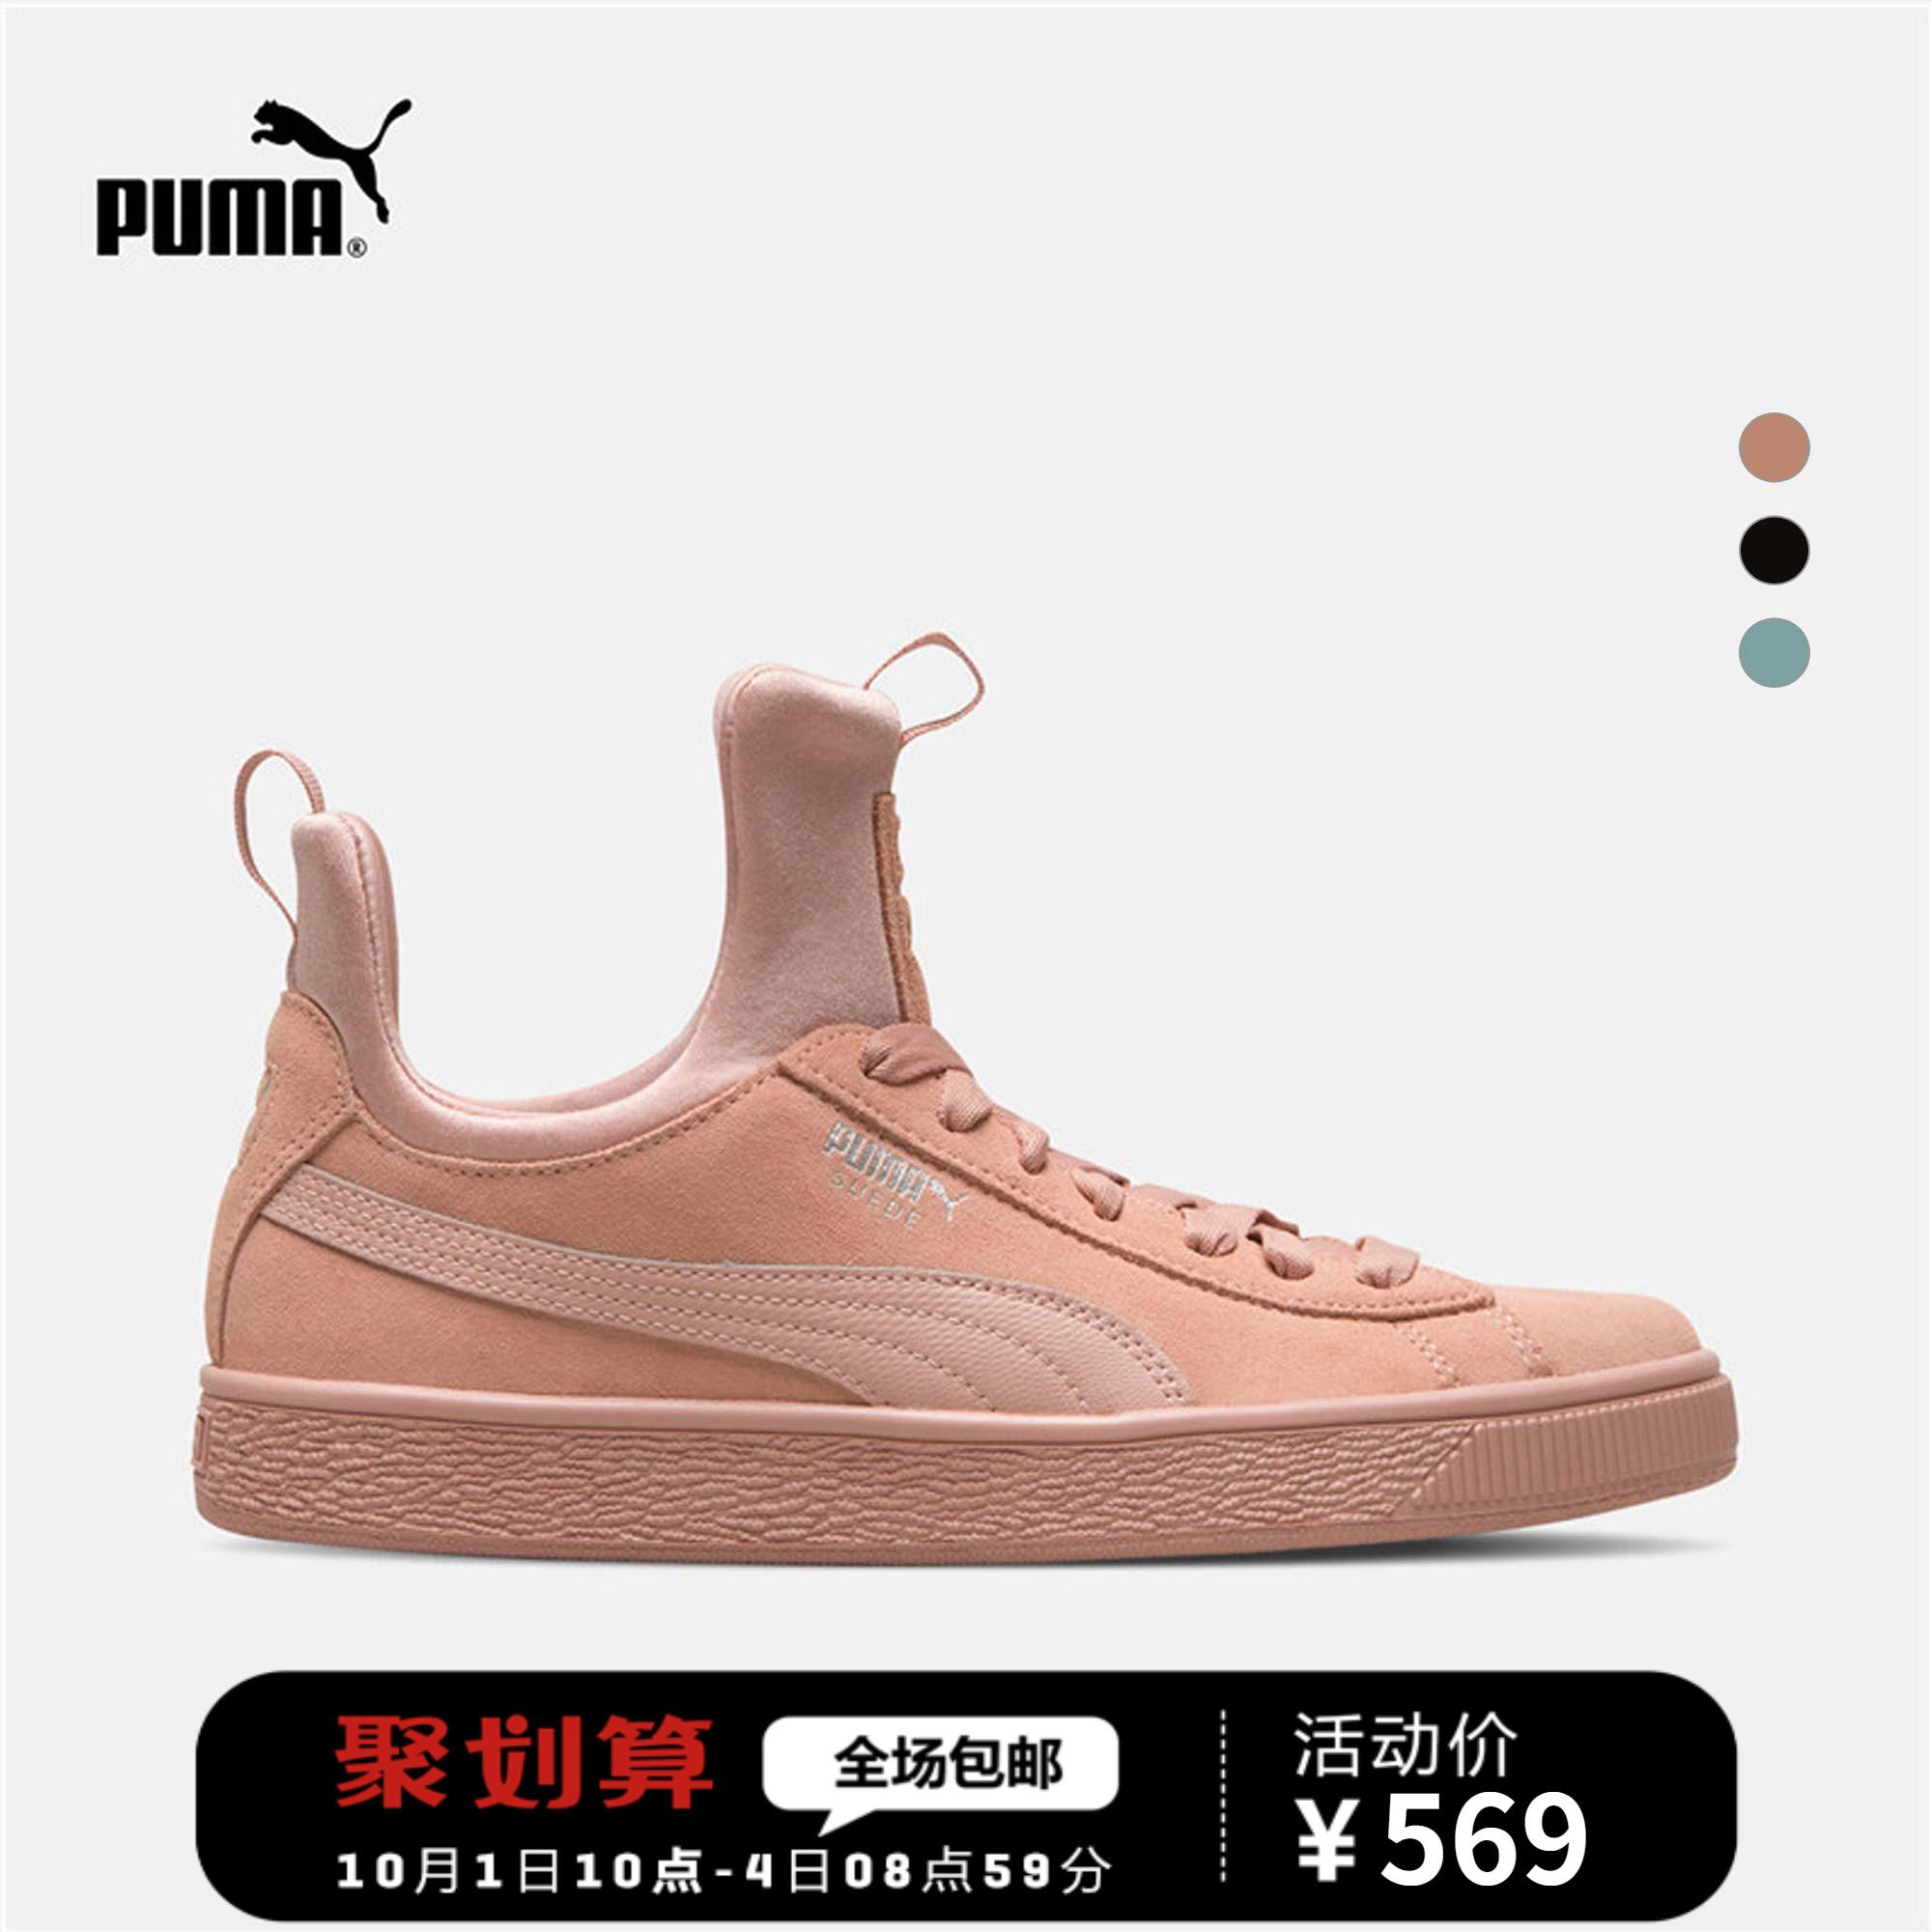 PUMA彪马官方 女子休闲鞋 SUEDE FIERCE 366010